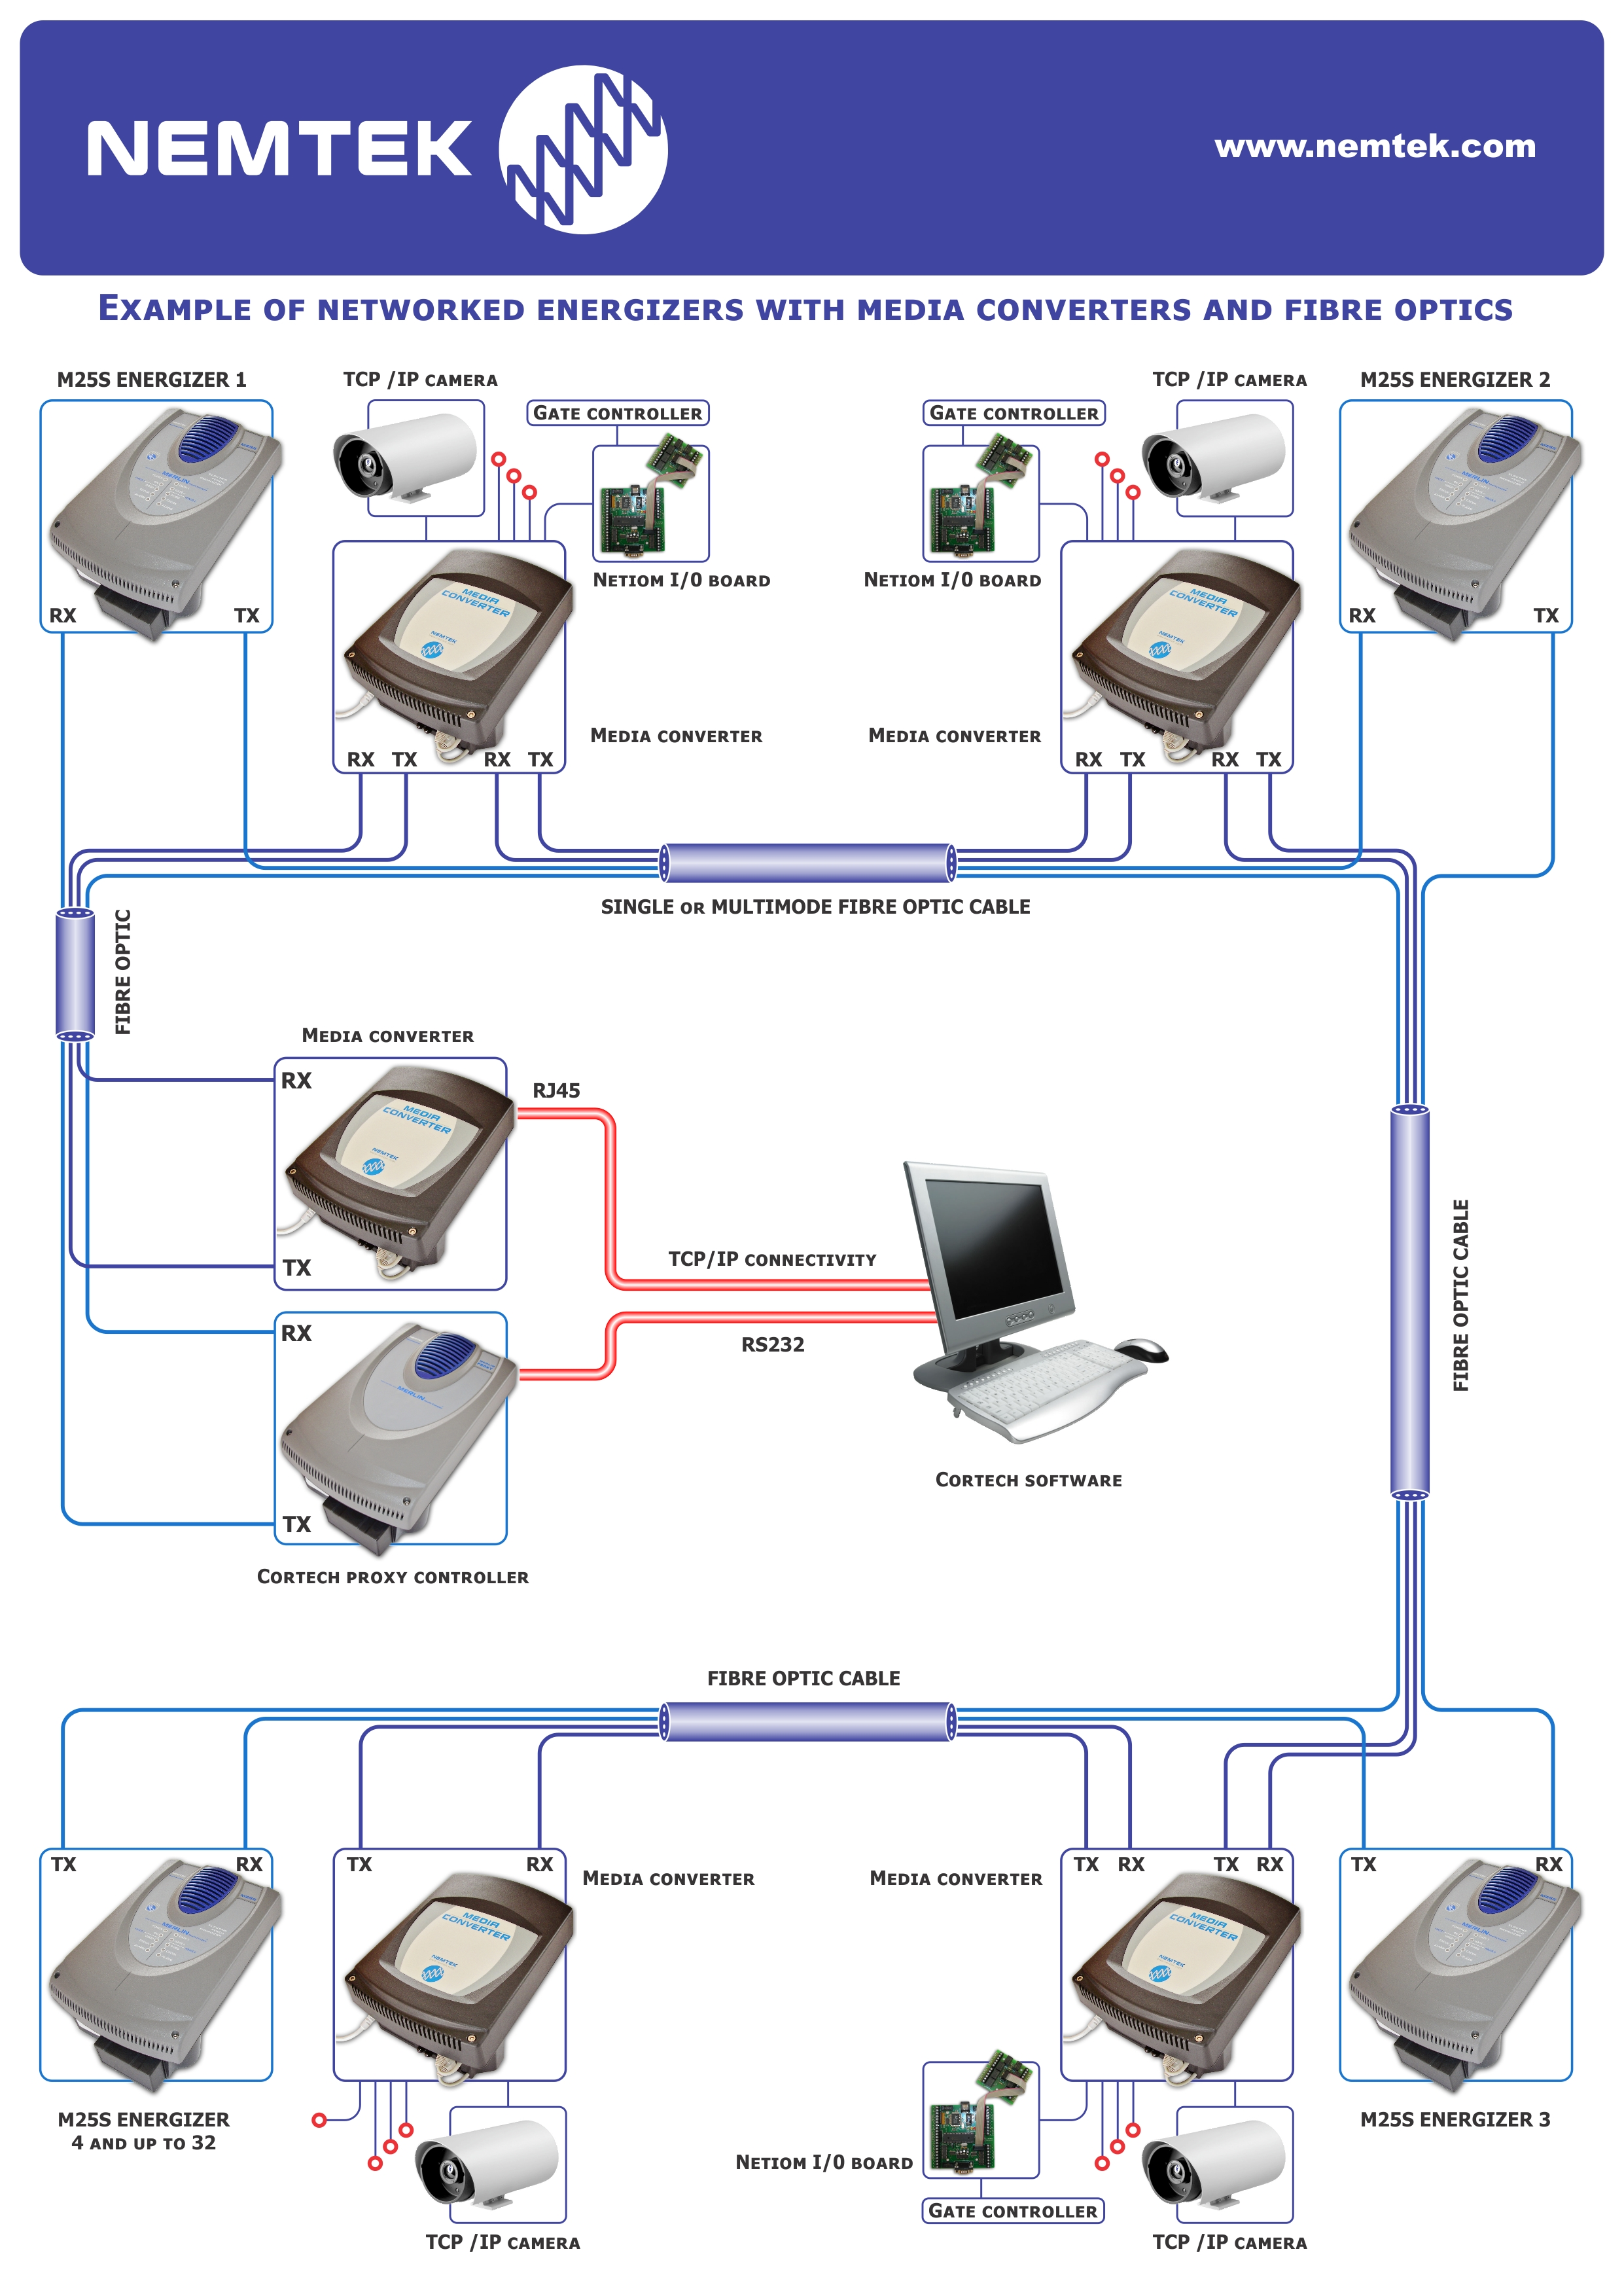 Nemtek Instruction Manual